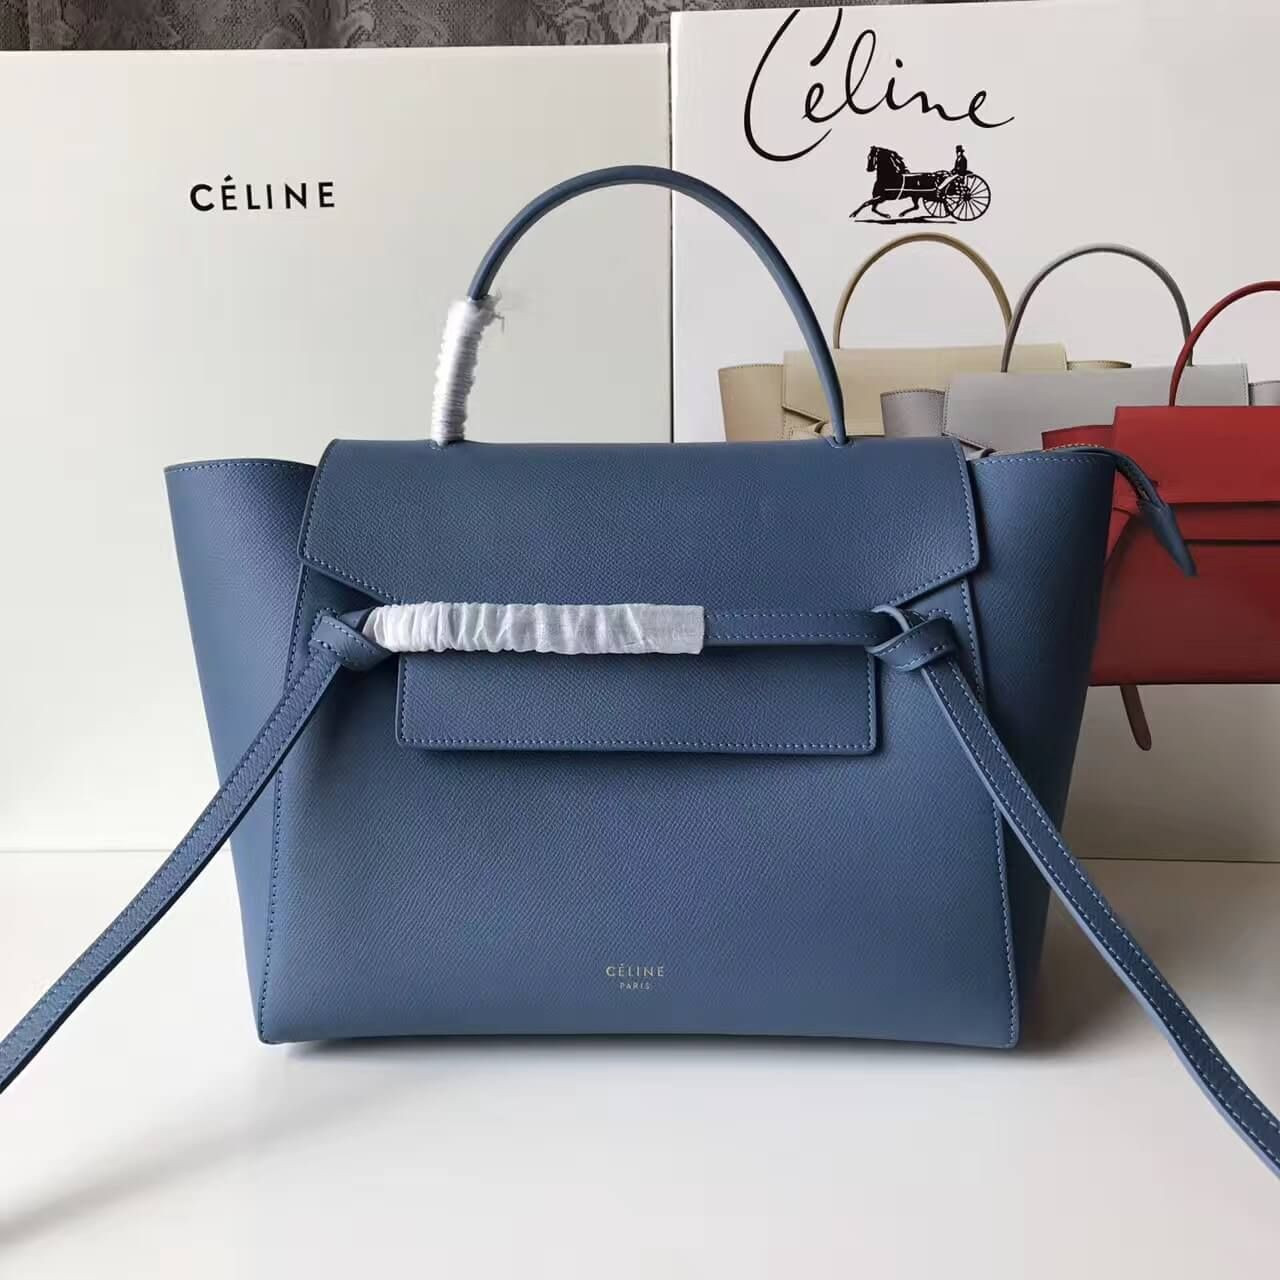 Celine Mini Belt Handbag 100% Authentic 80% Off  3f1de30227612